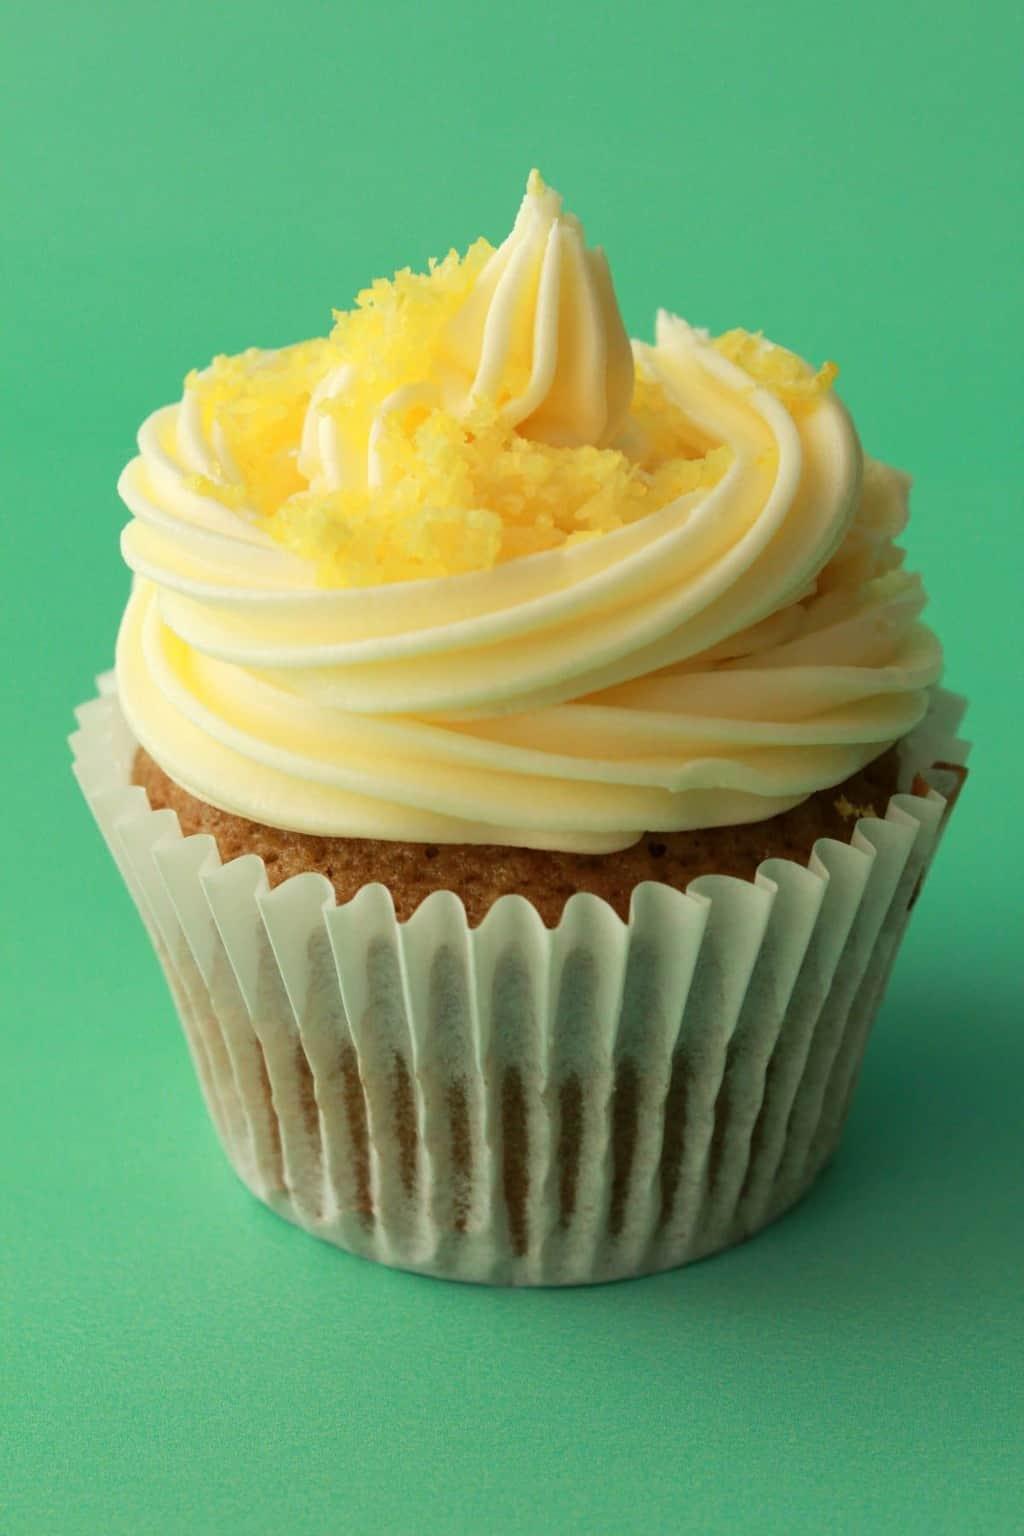 Vegan lemon cupcake topped with lemon frosting and lemon zest.